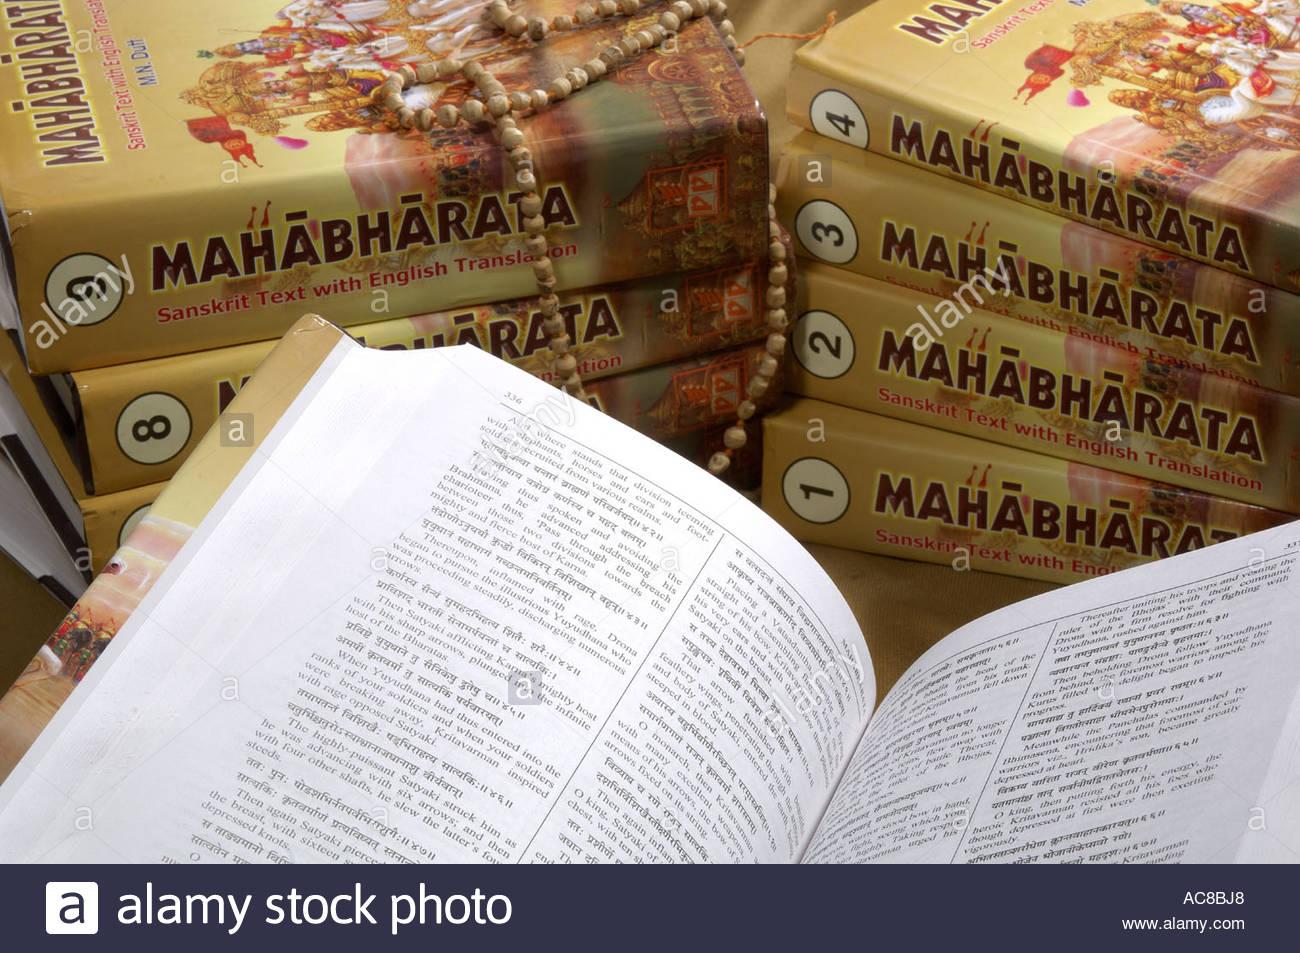 Indian holy Hinduism books on Mahabharata in Nine Volumes India Asia - Stock Image